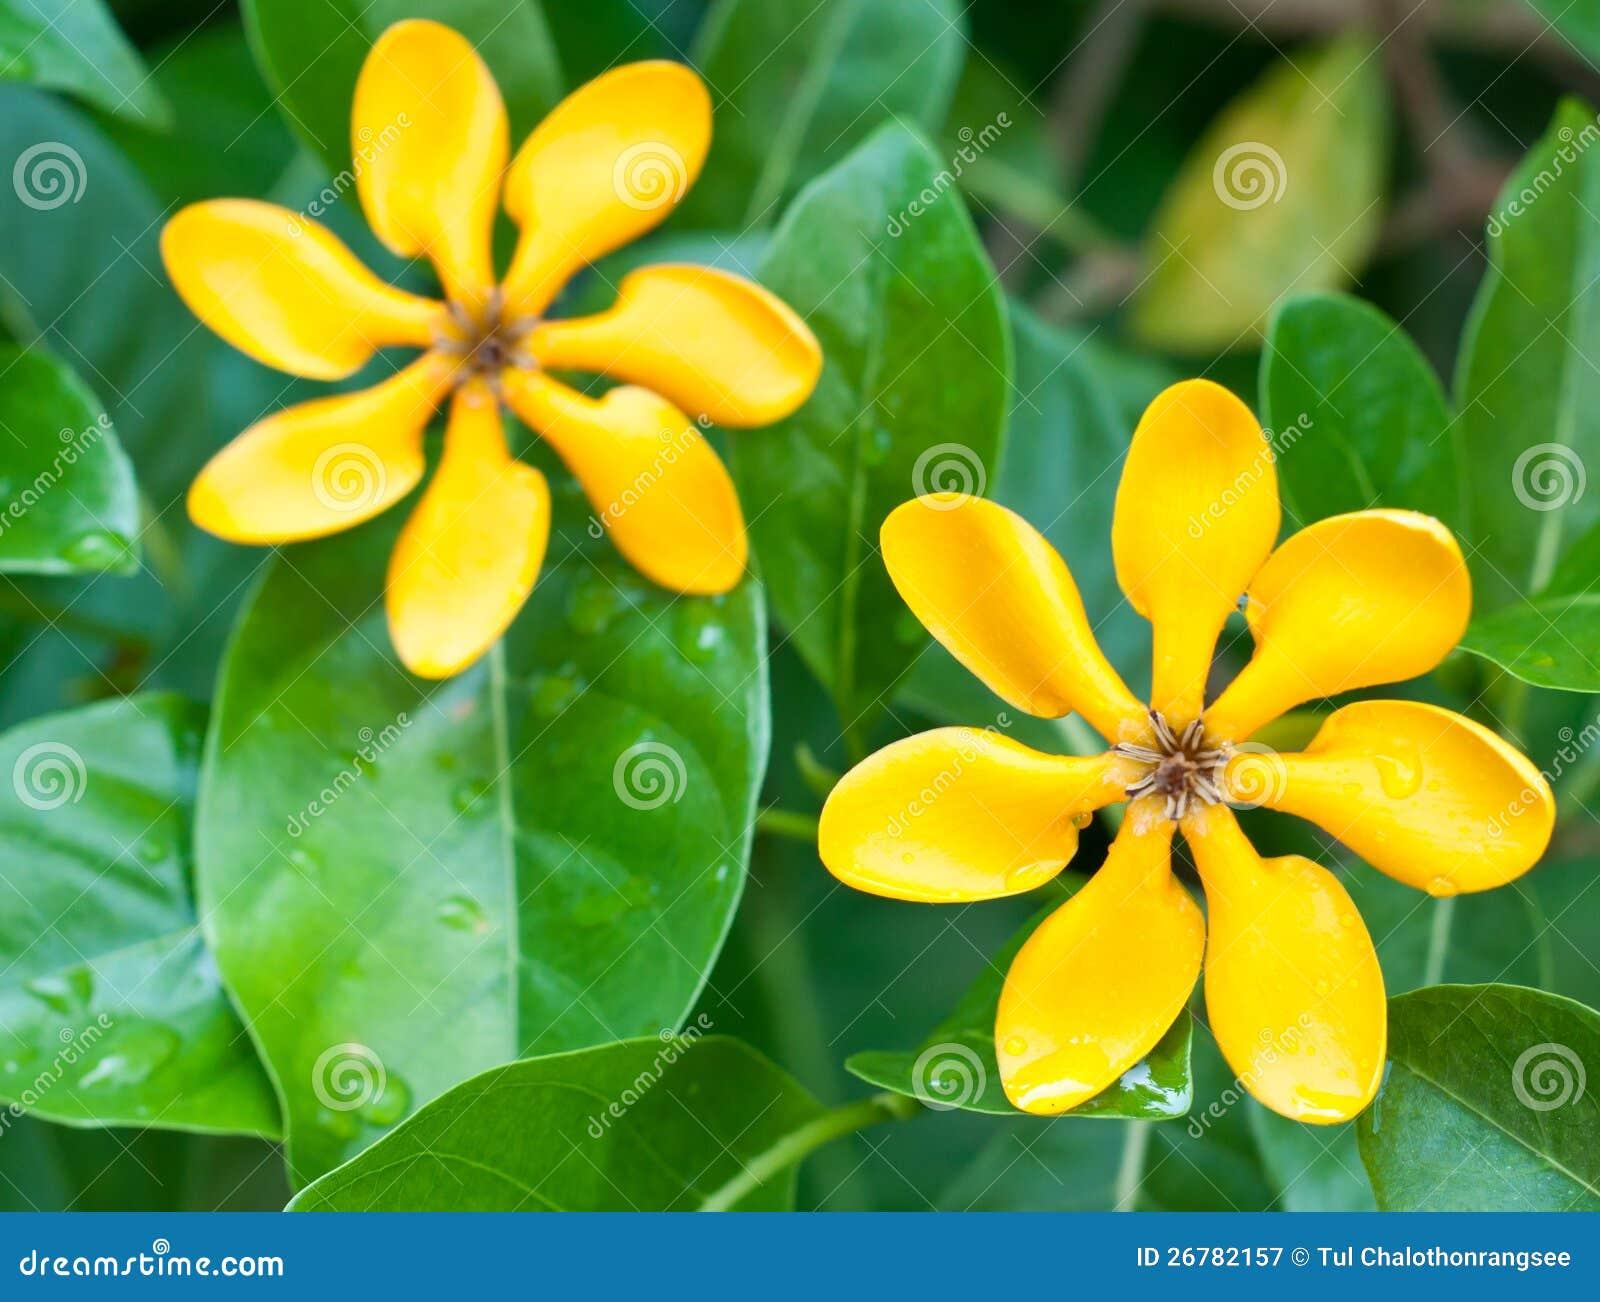 Golden Gardenia Flowers Stock Image Image Of Invite 26782157